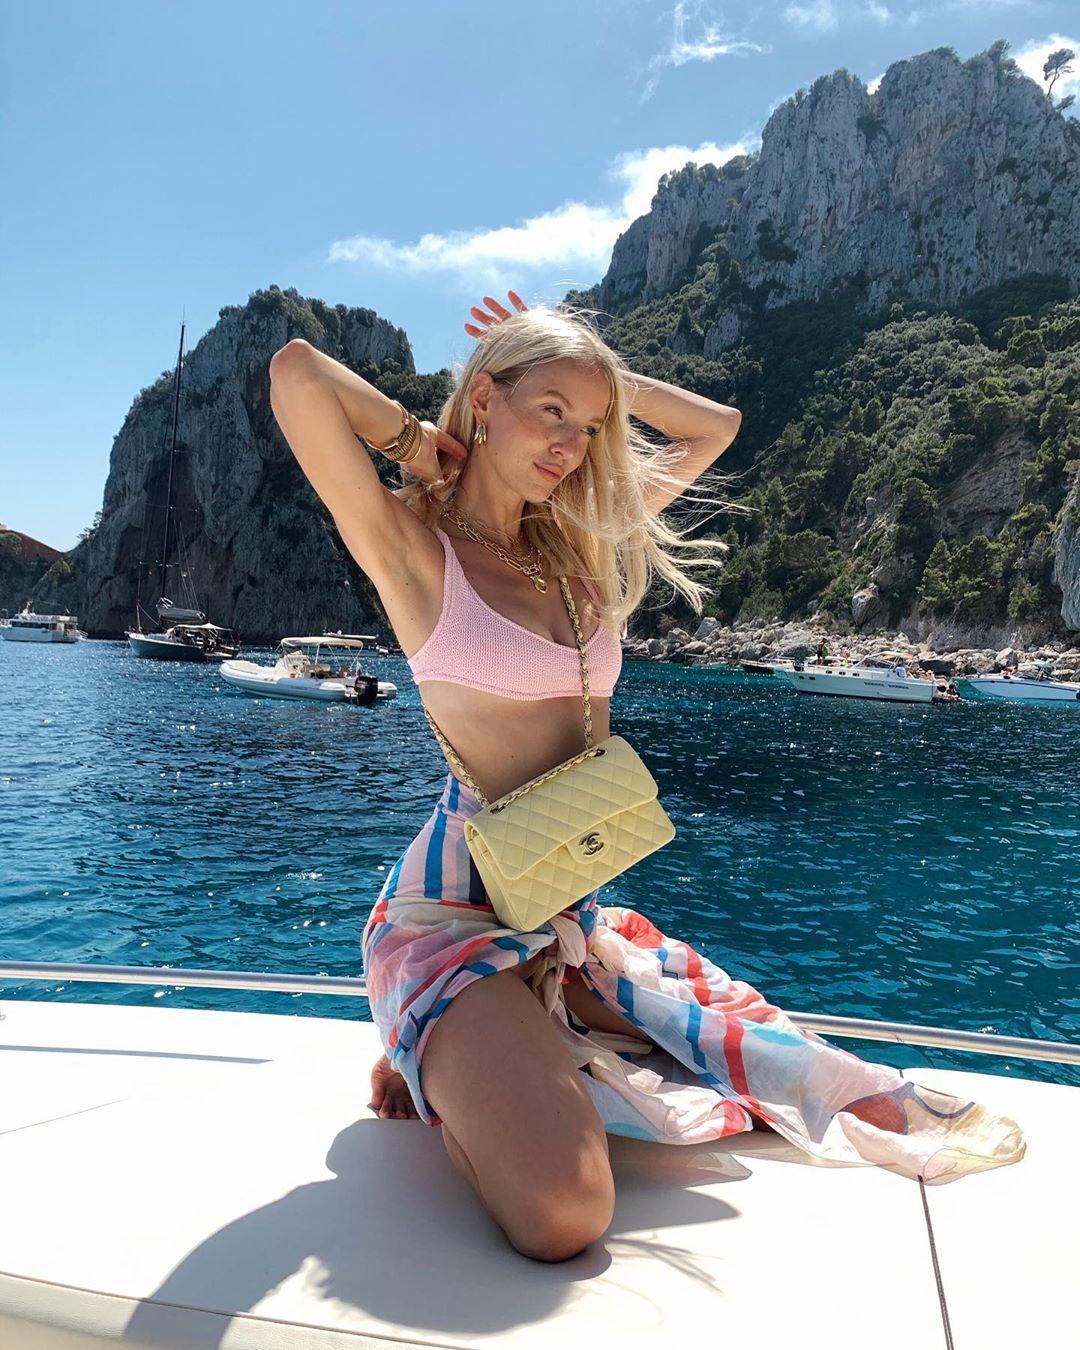 Birthday boat trip to Capri